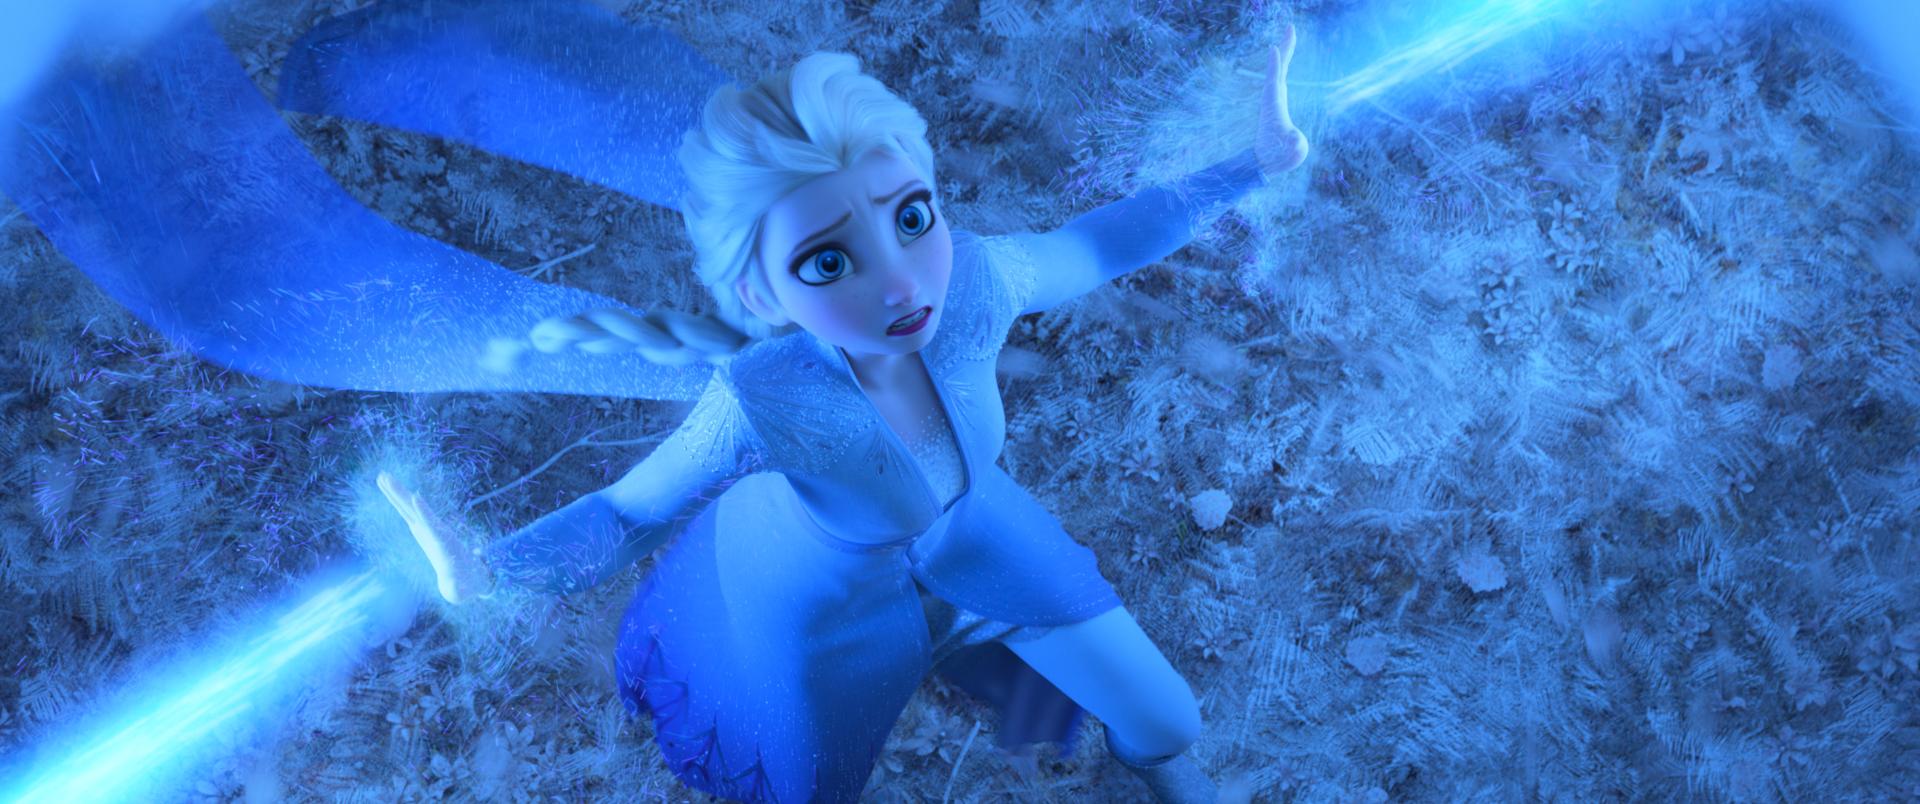 Frozen 2 Gets An Earlier Than Expected Release On Disney Deadline